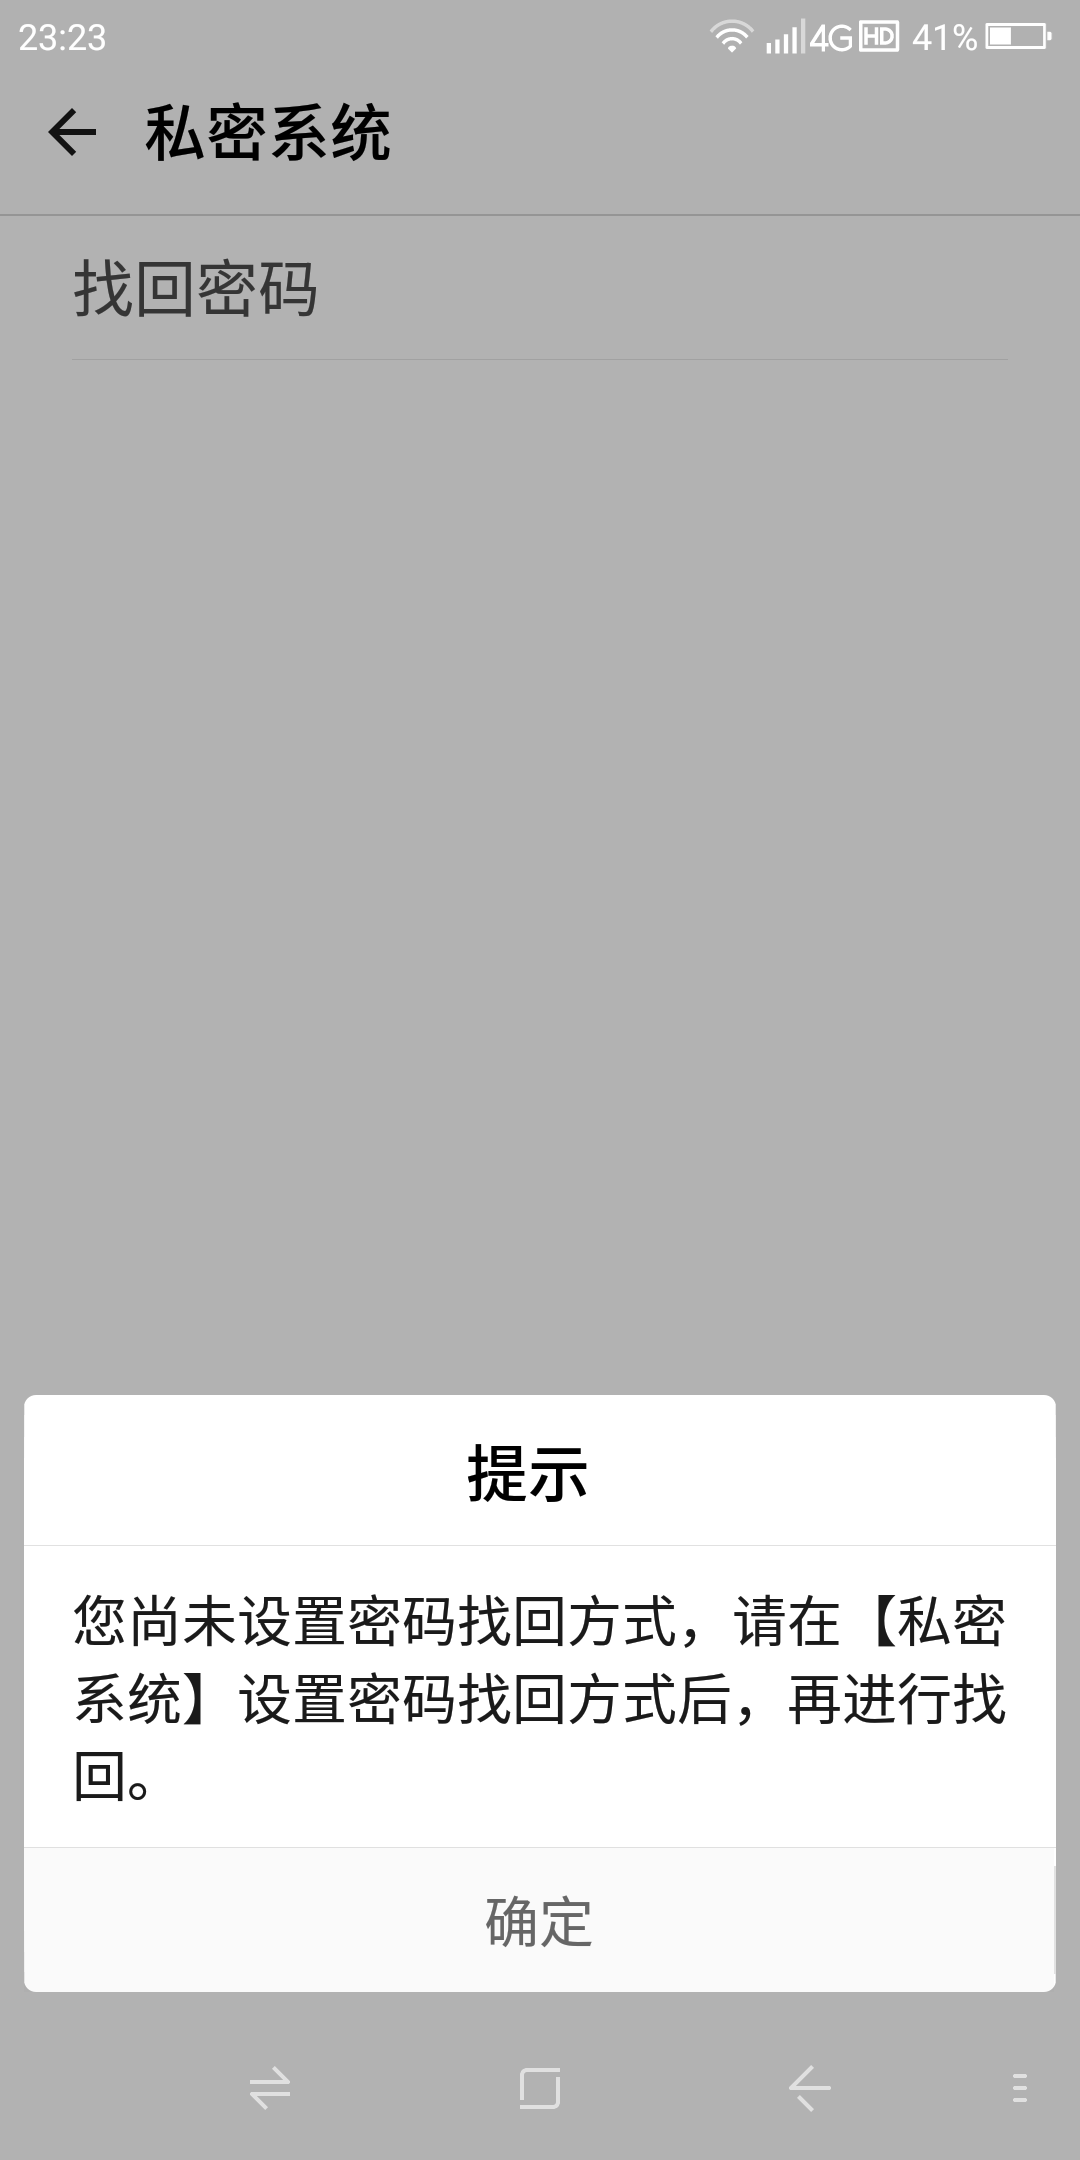 Screenshot_2018-12-11-23-23-37.png